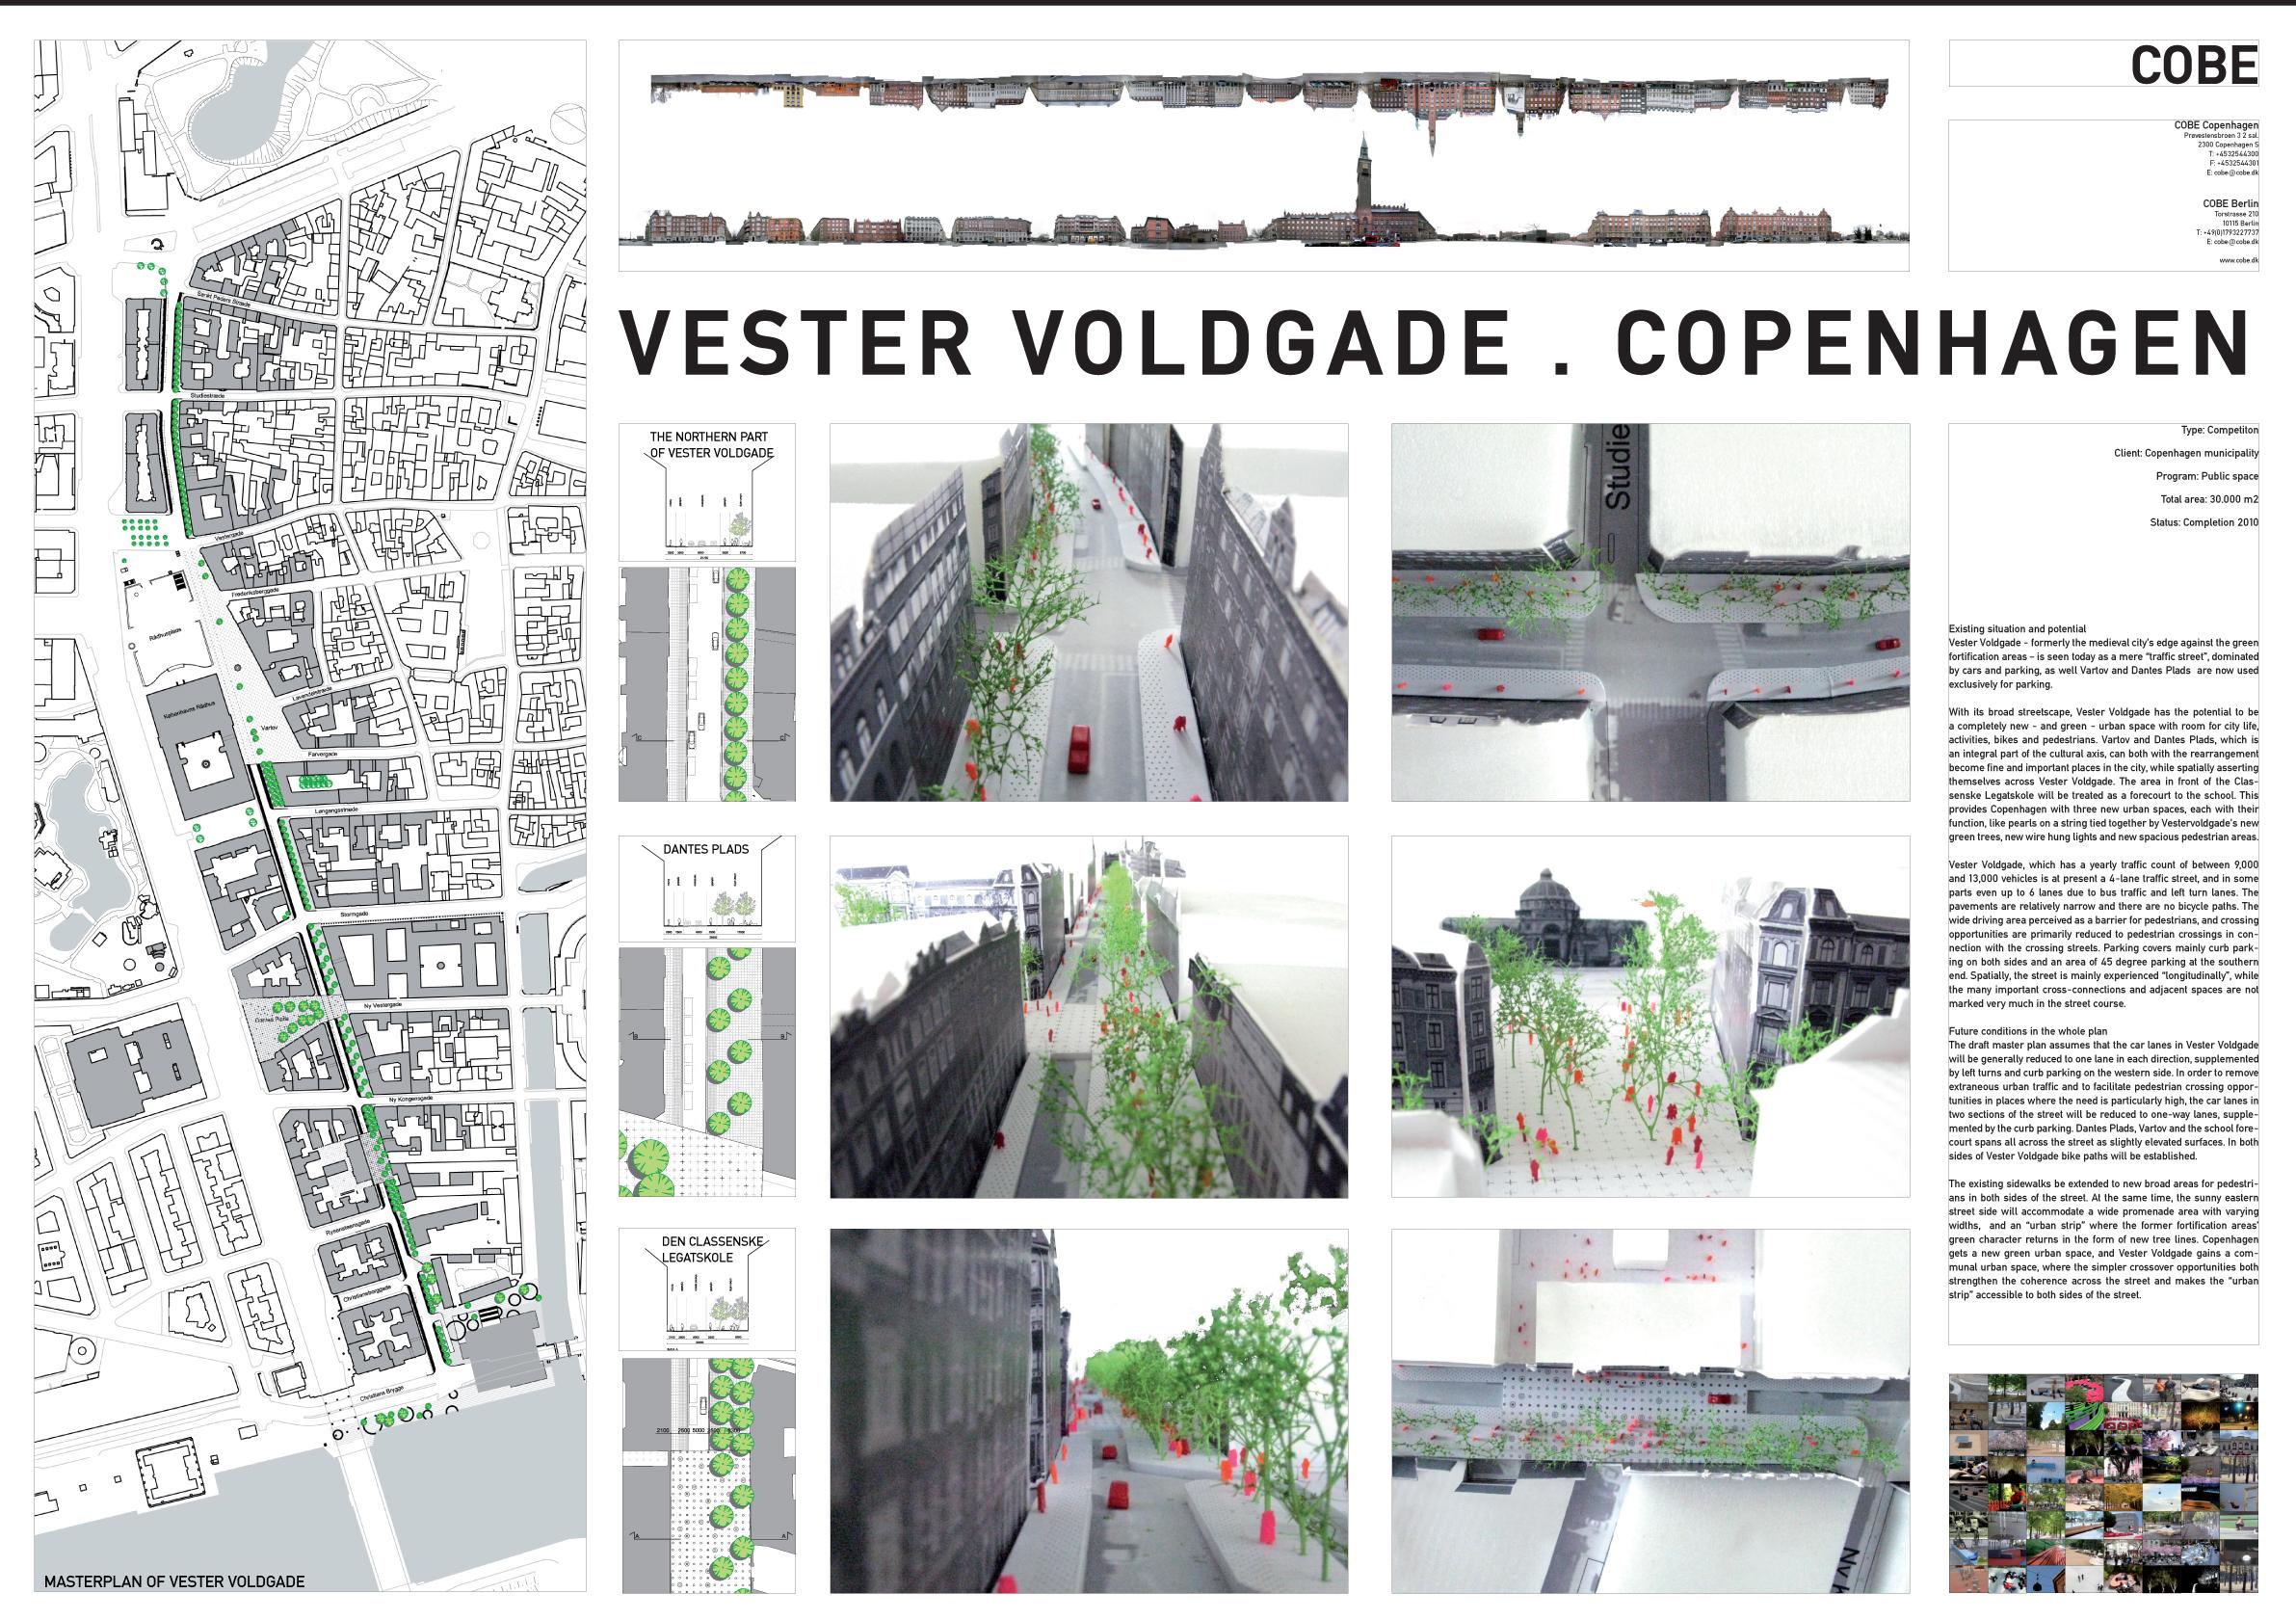 COBE, Vester Voldgade, Plan, 2013.